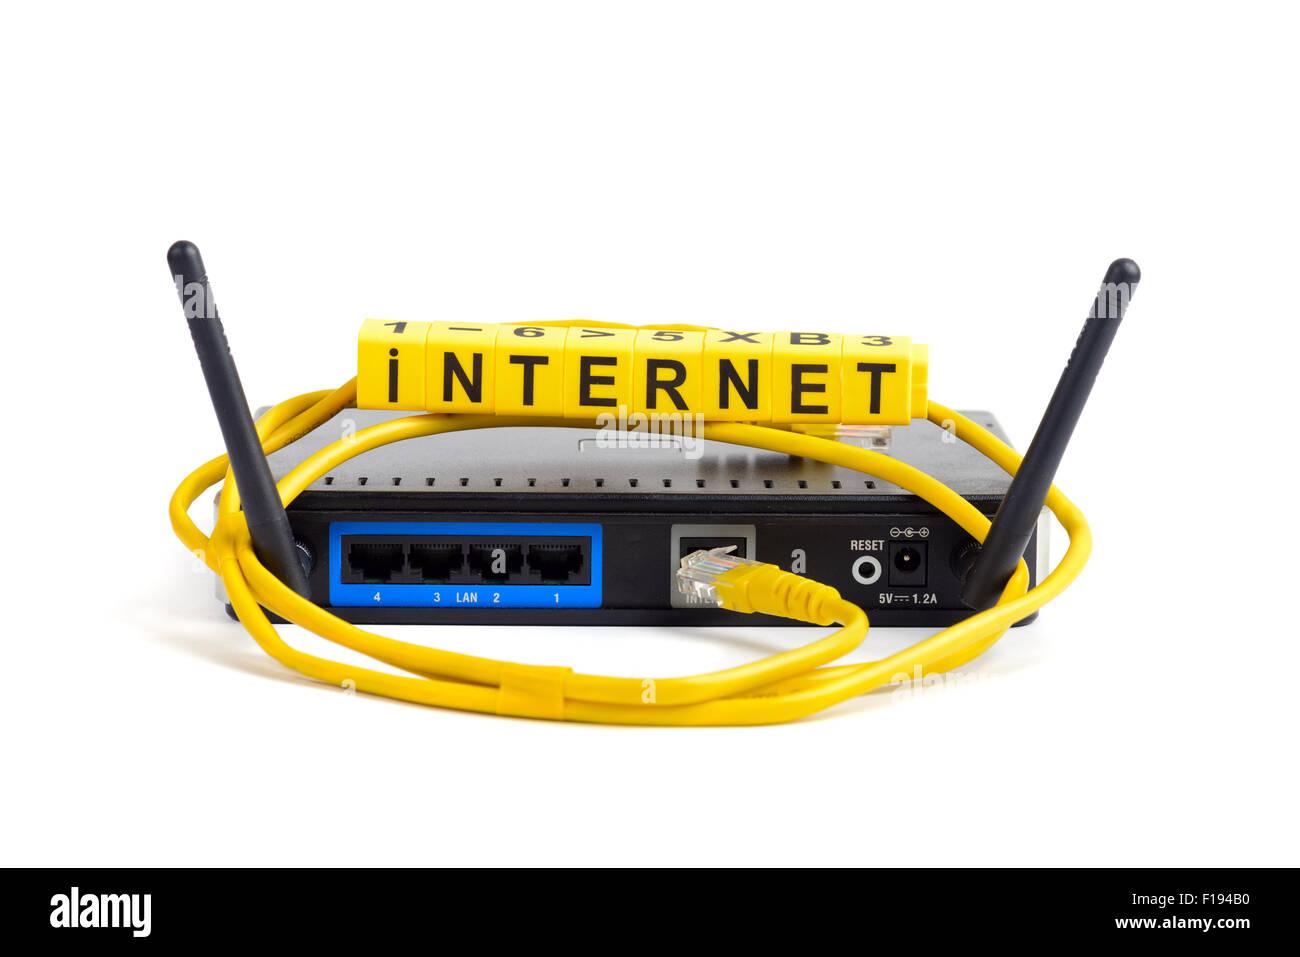 Wireless wi-fi router con dos antenas y cables aislados signo Imagen De Stock